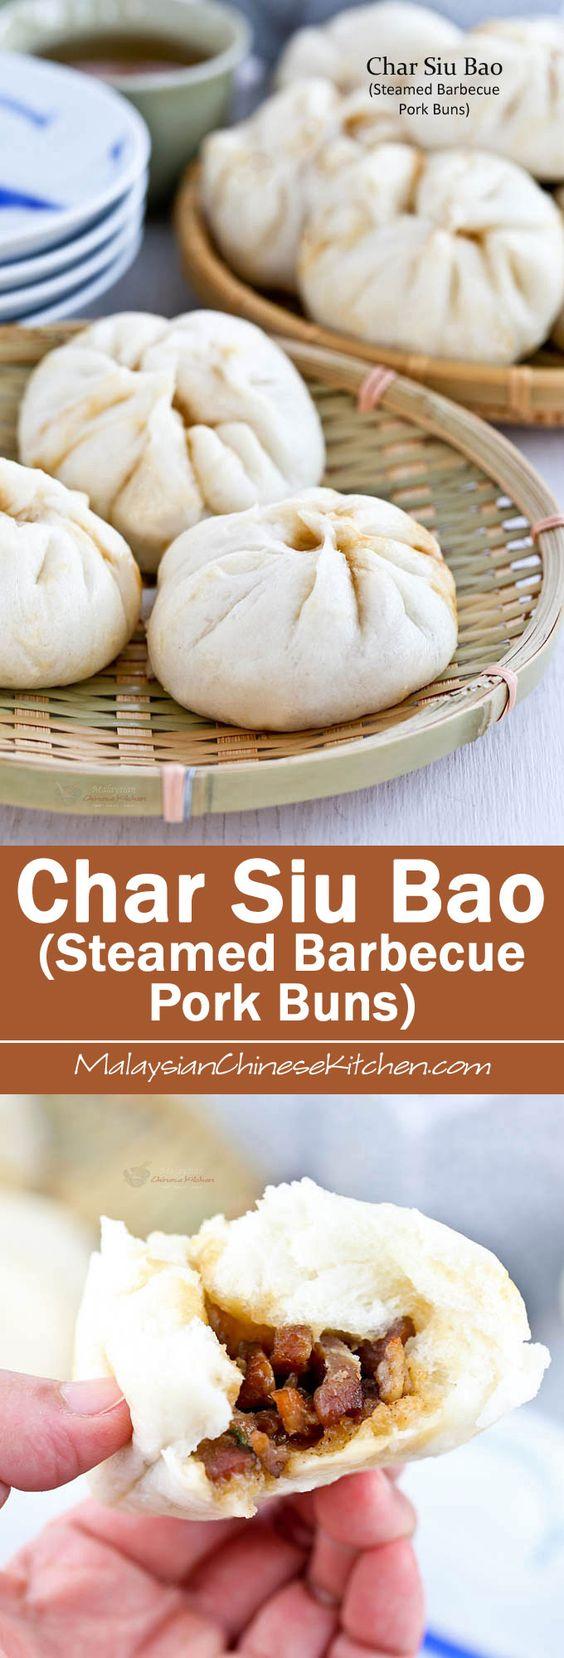 Char Siu Bao (Steamed Barbecue Pork Buns) | Recipe | Char Siu, Pork ...